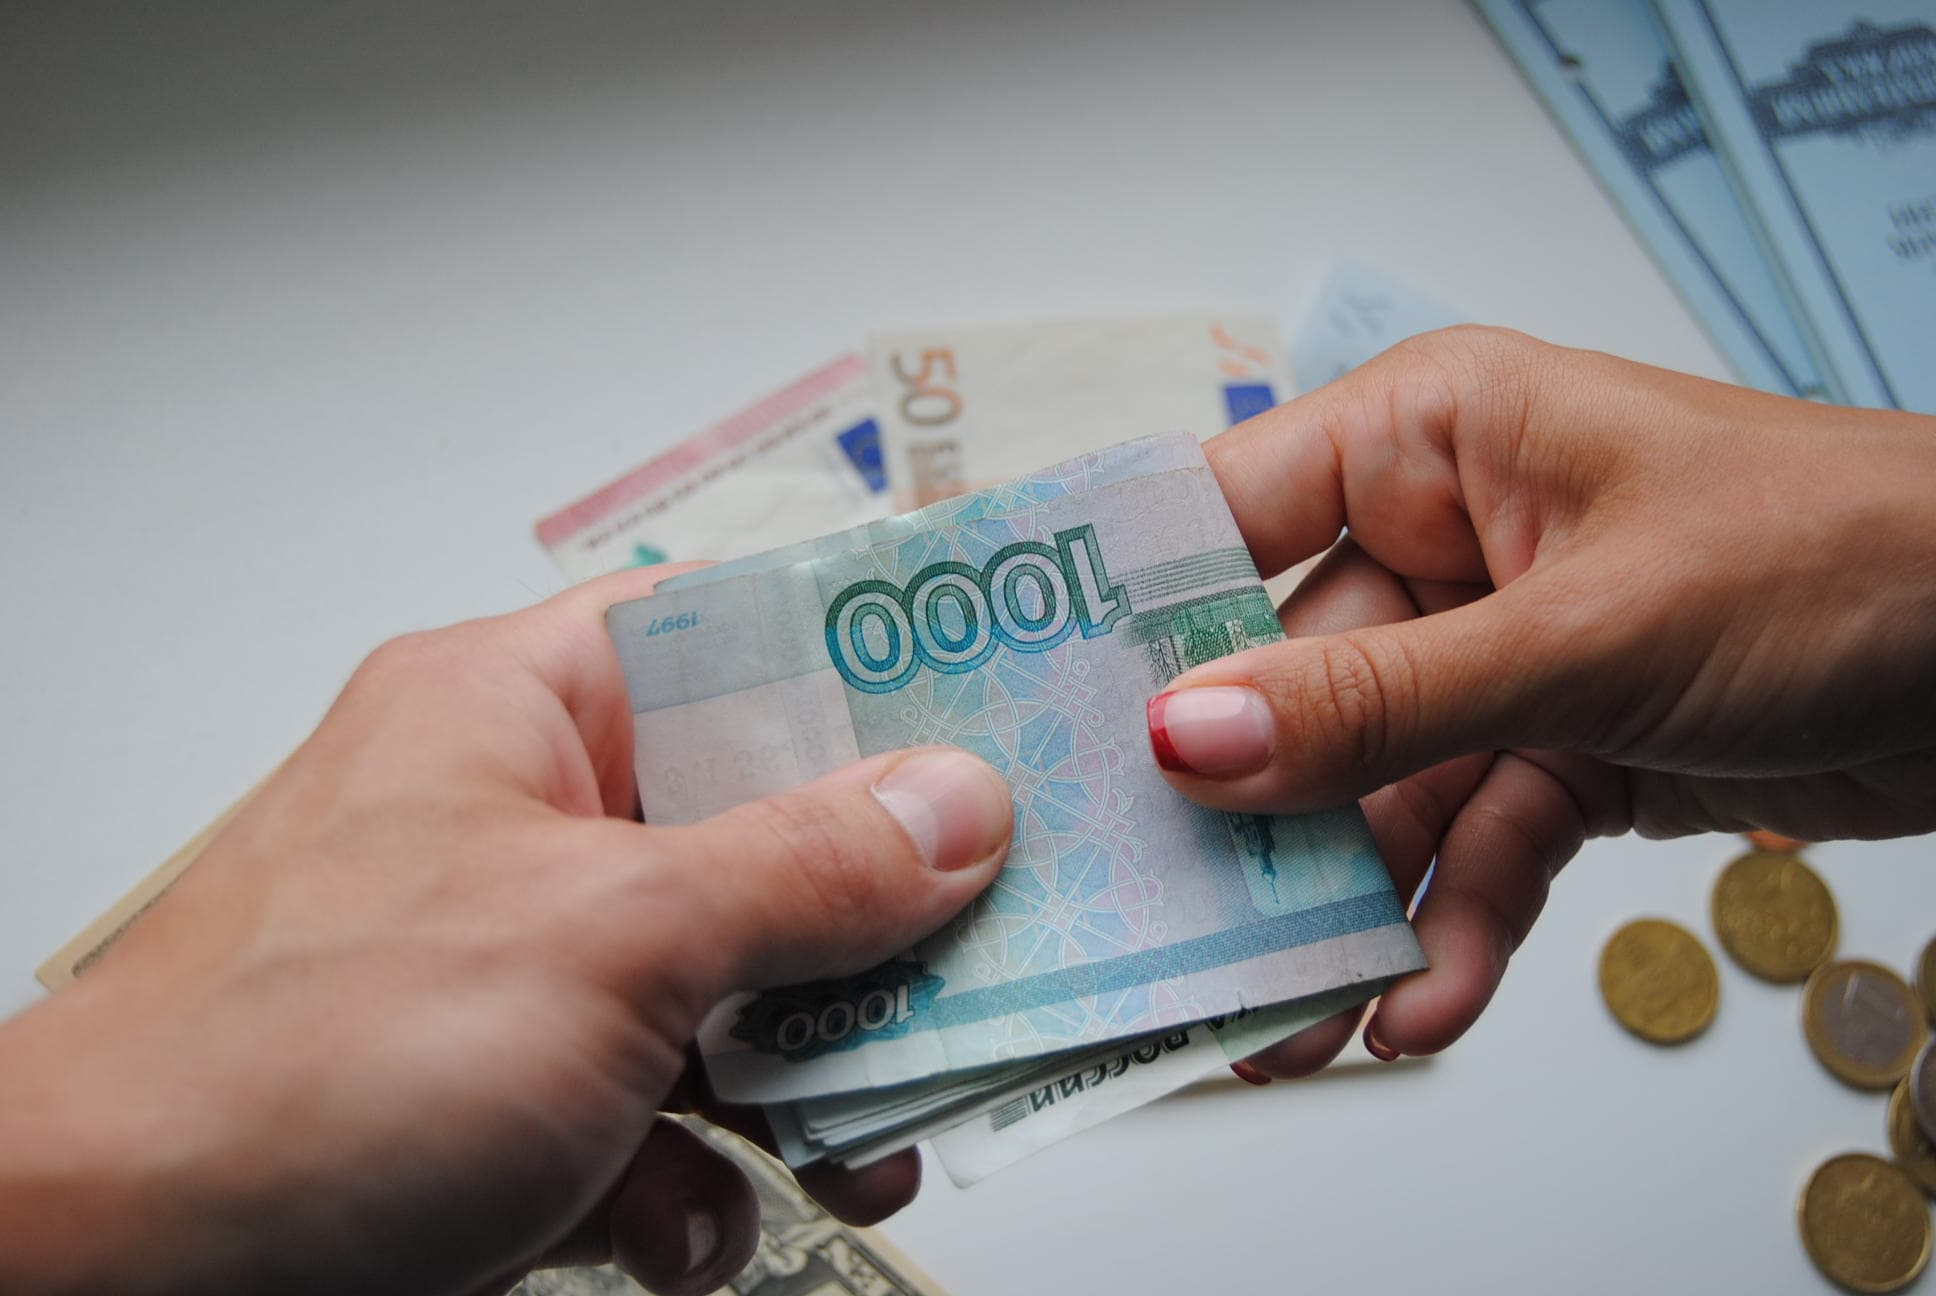 Как перевести деньги с карты на карту через интернет банкинг белвэб